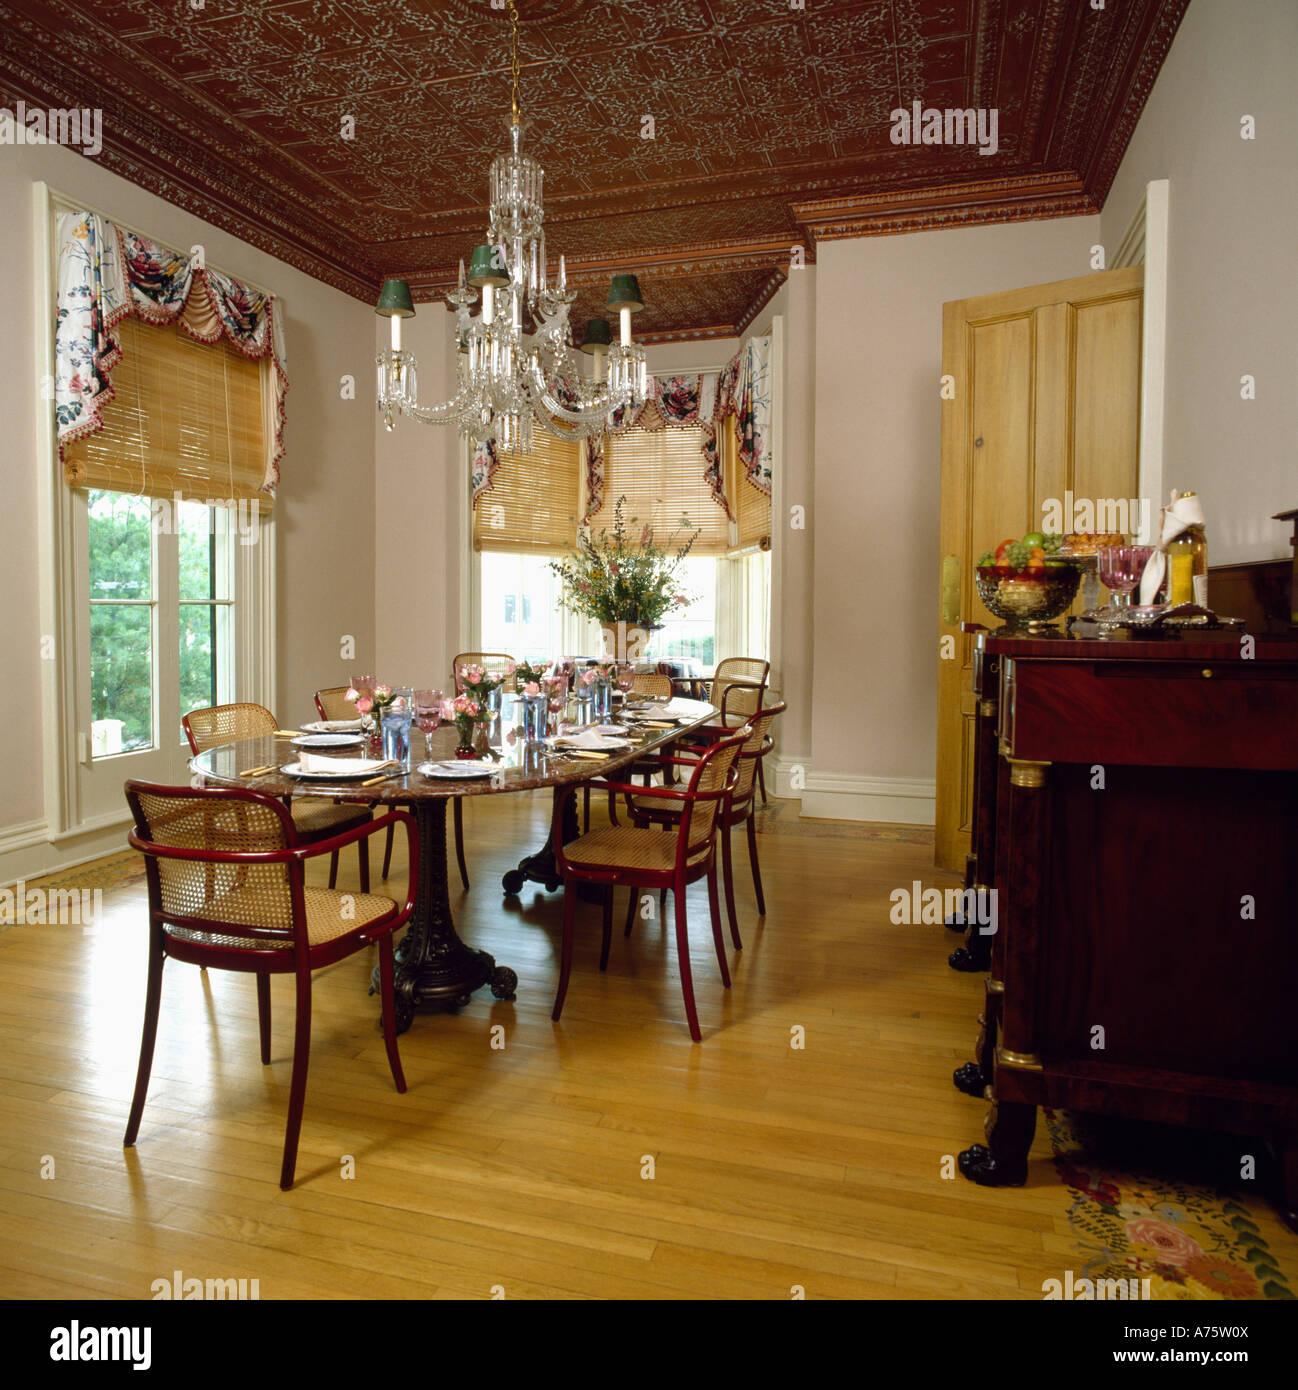 Paese sala pranzo con un lampadario sopra tavolo e pavimento ...